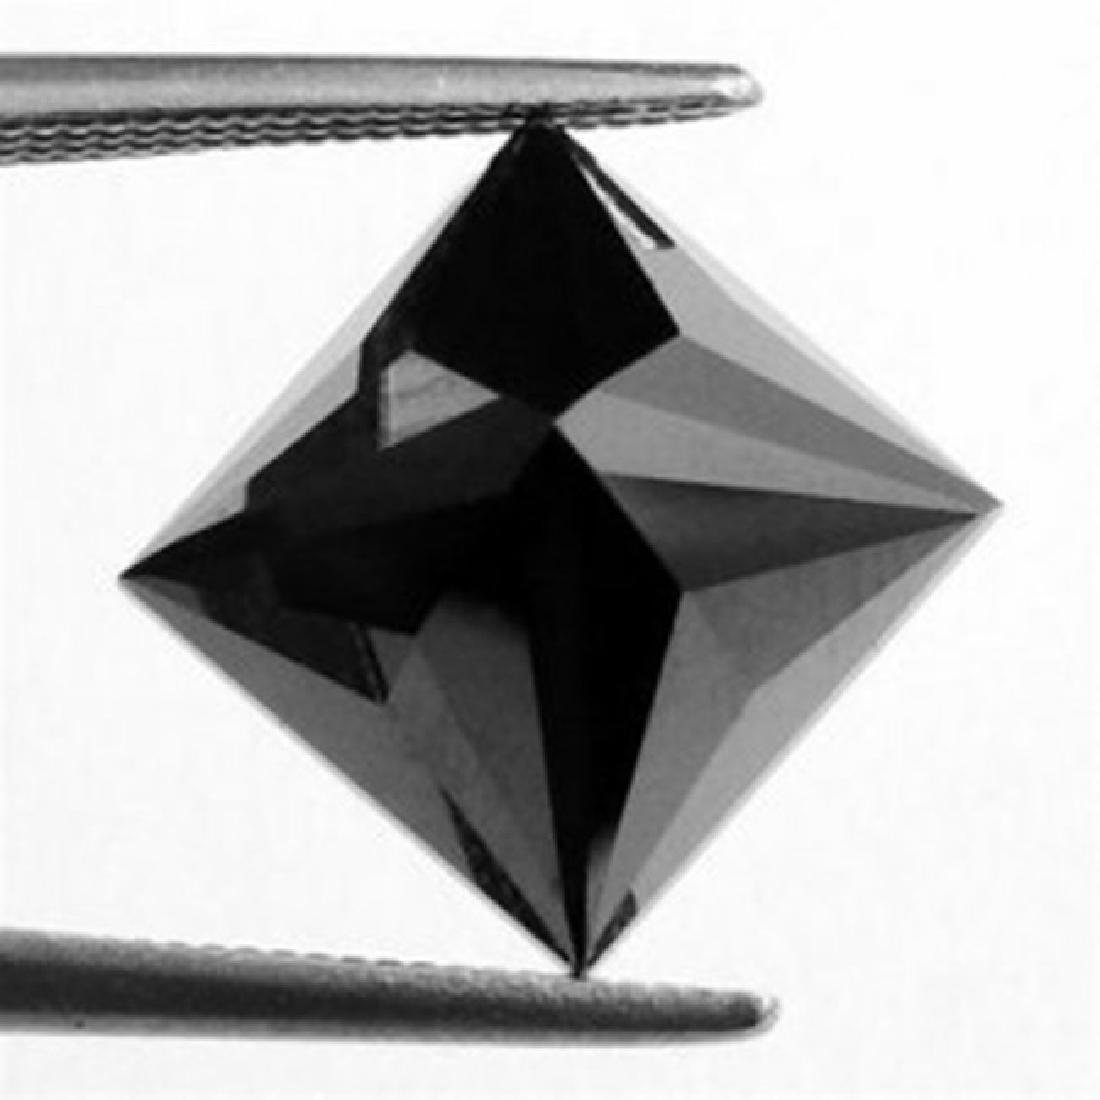 Black Diamond Princess Cut 1.43Ct 6.4x6.4x4.7 mm - 2